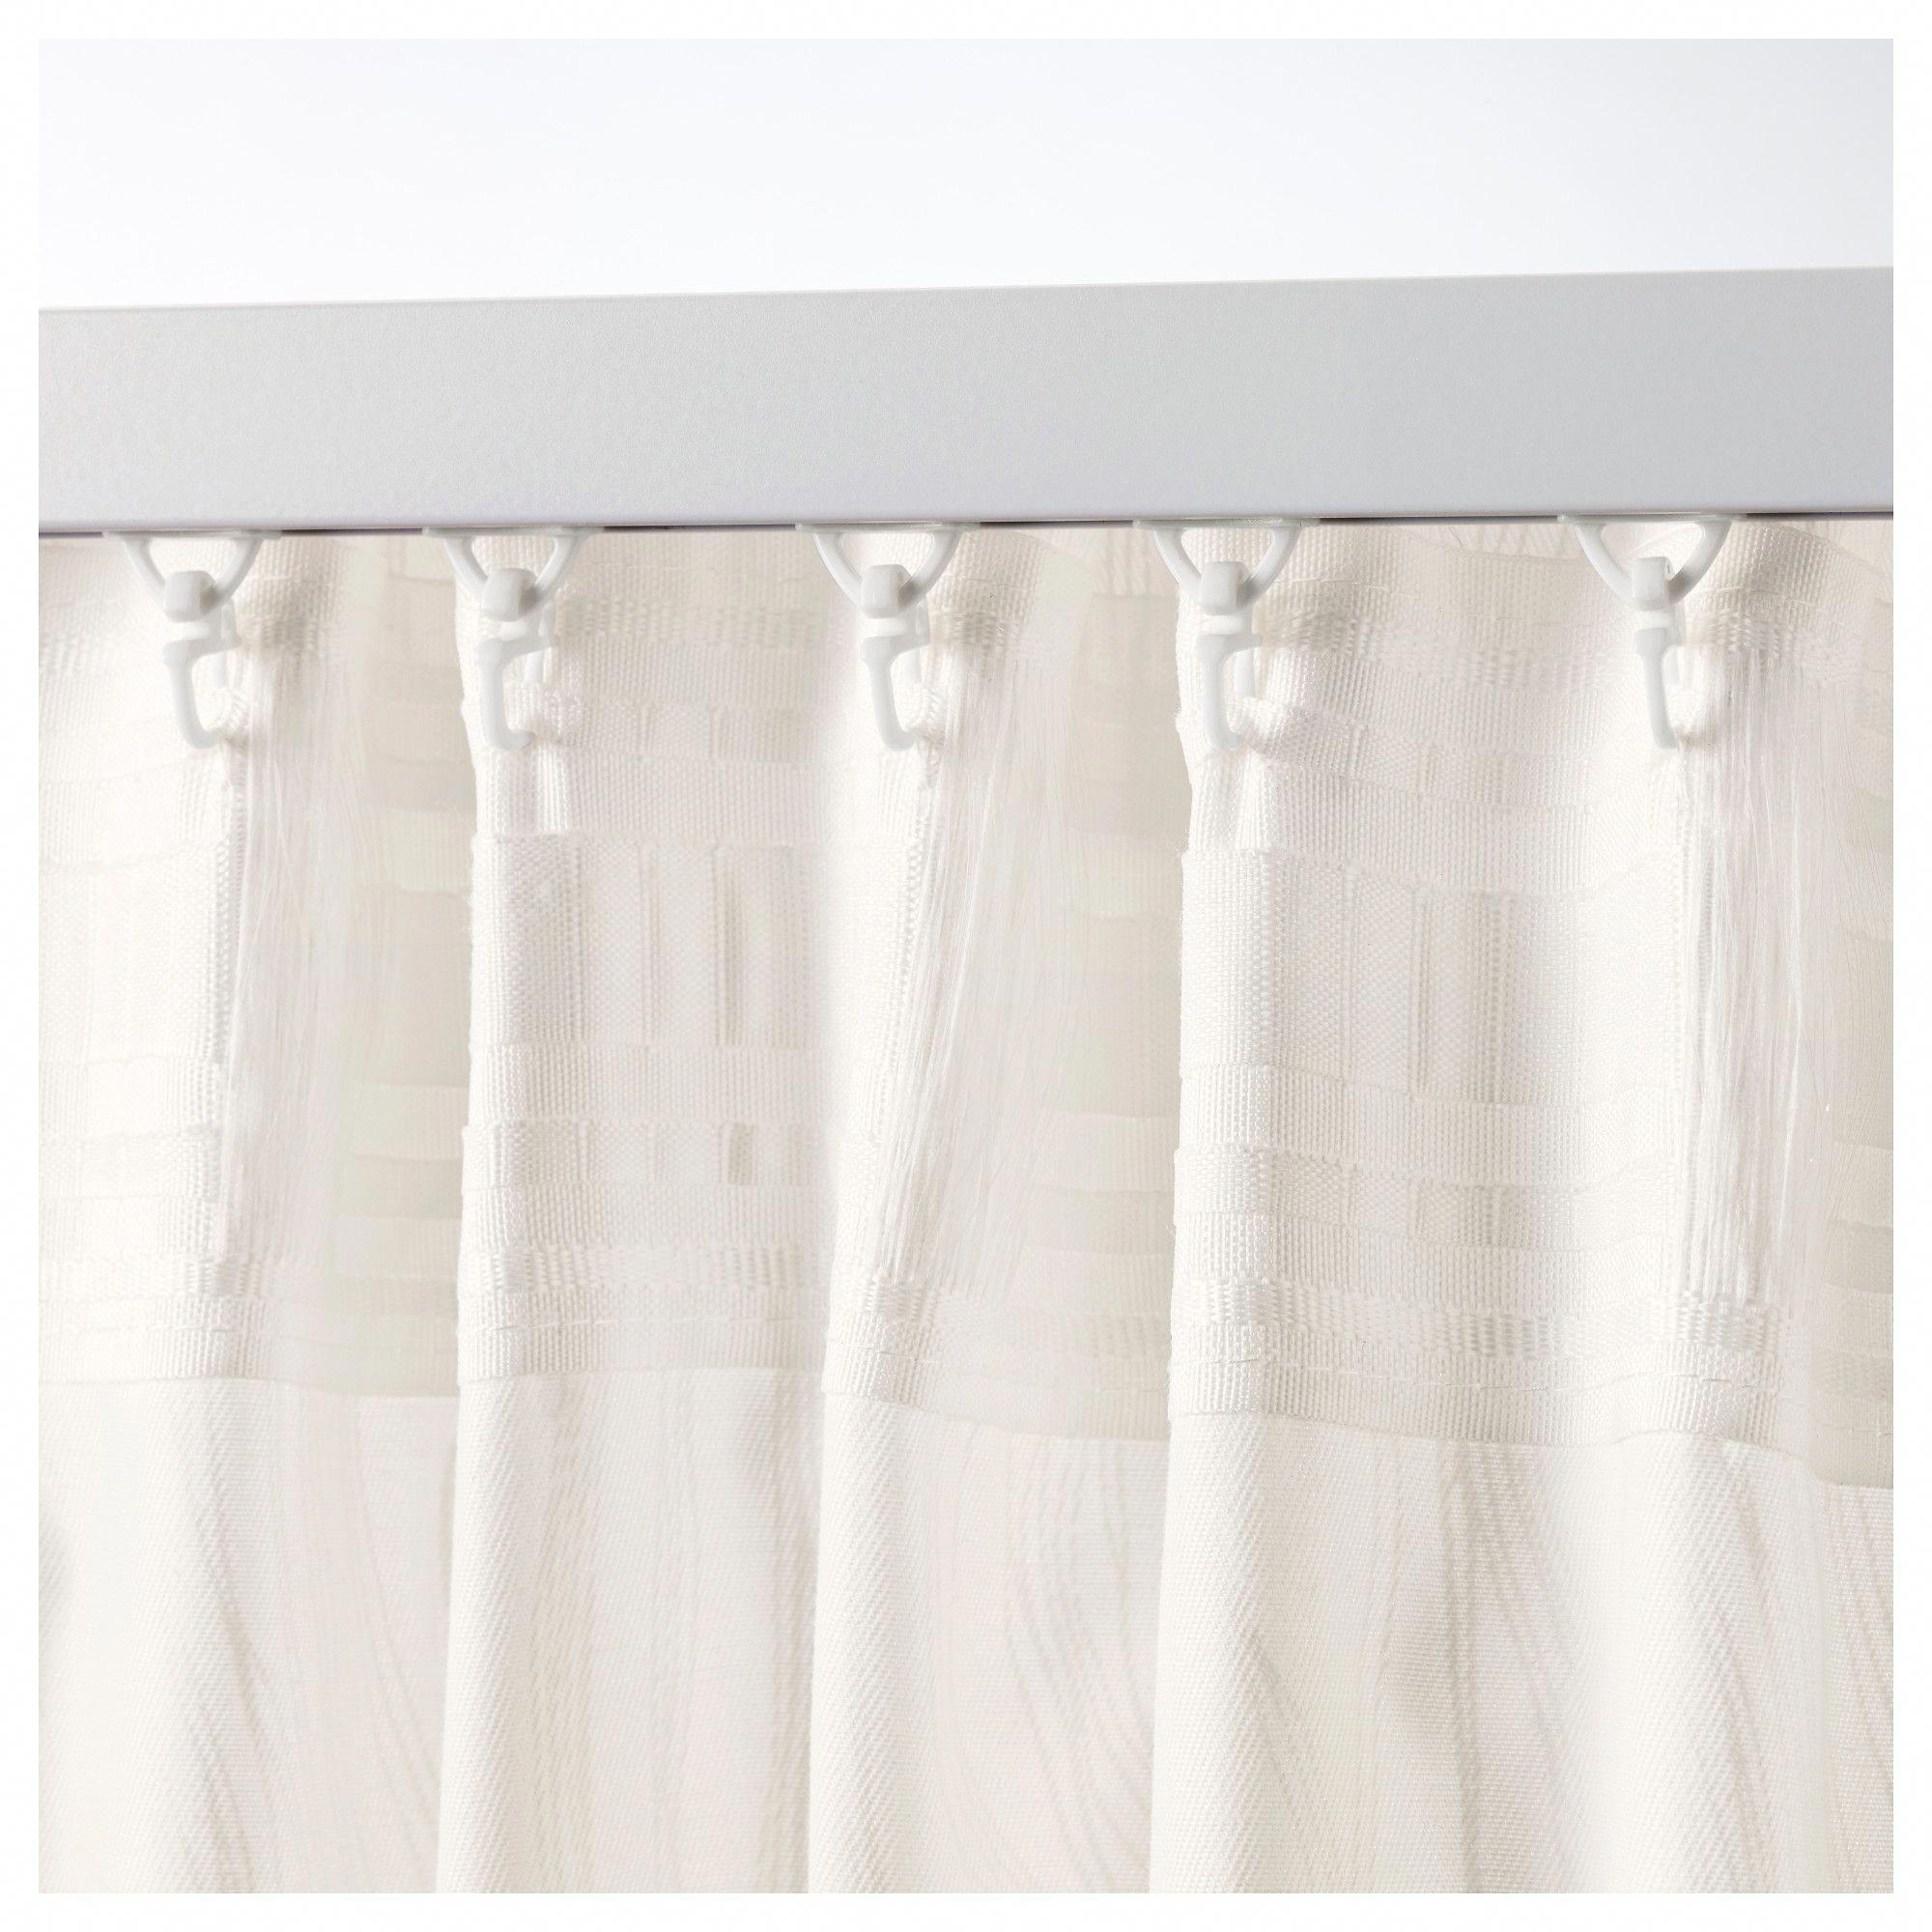 Ikea Mildrid Curtains 1 Pair White White Rusticstyle Guest